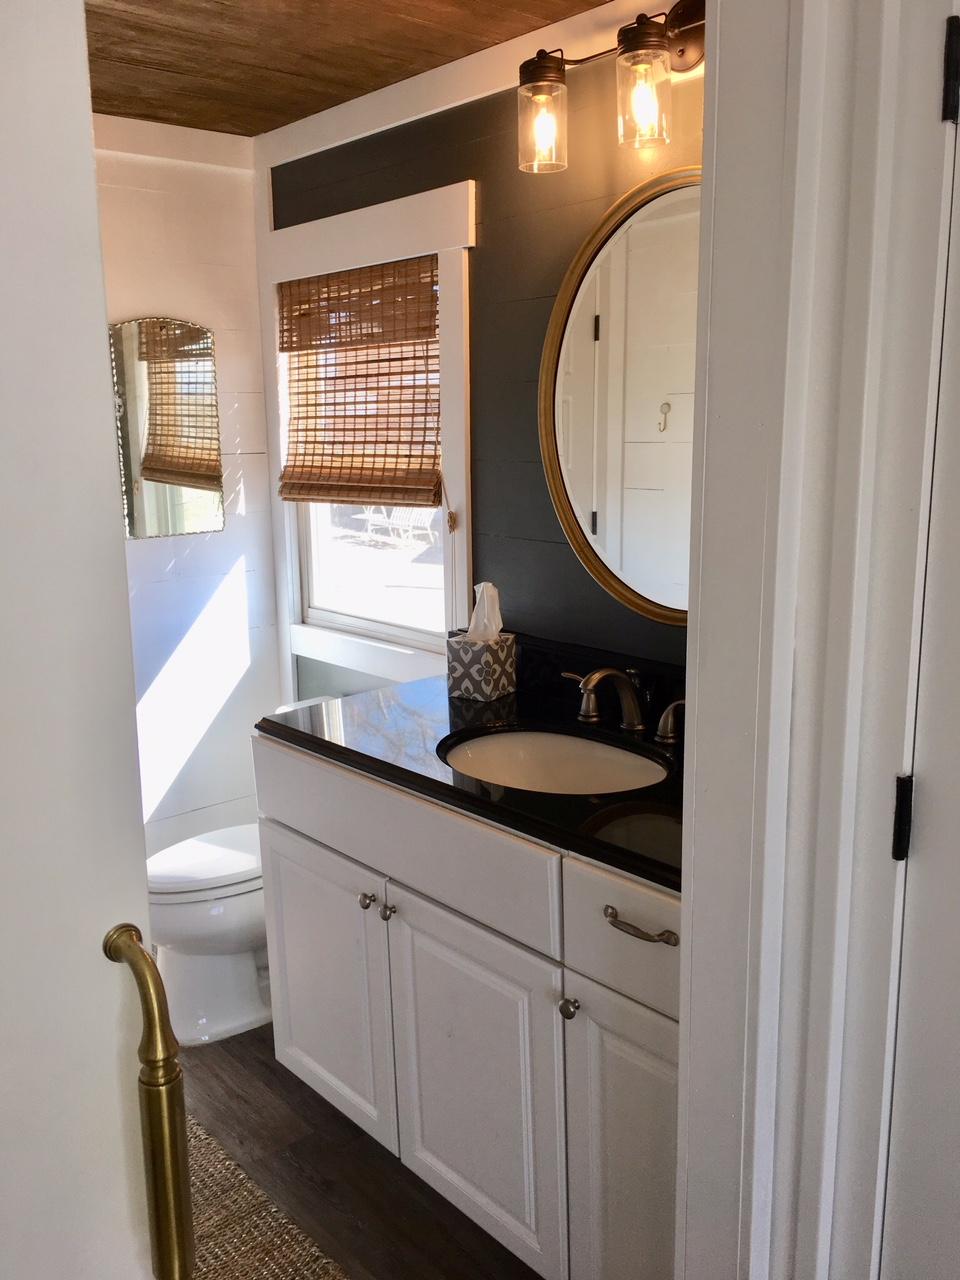 rdf bnb bathroom.JPG